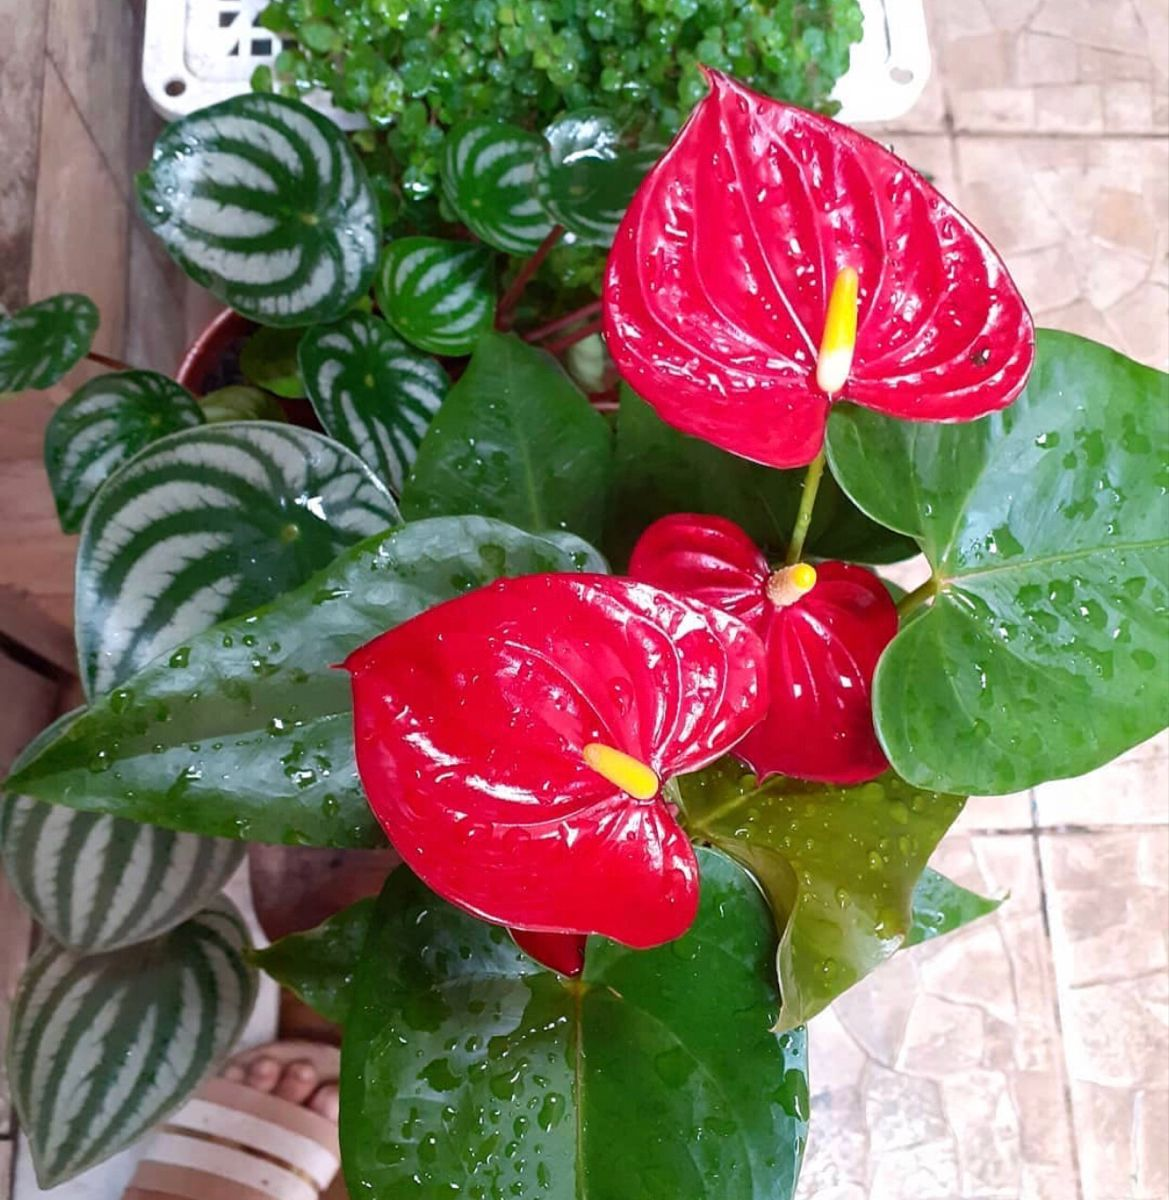 Anthurium For Sale In 2020 Bulk Flowers Online Anthurium Flower Wholesale Flowers